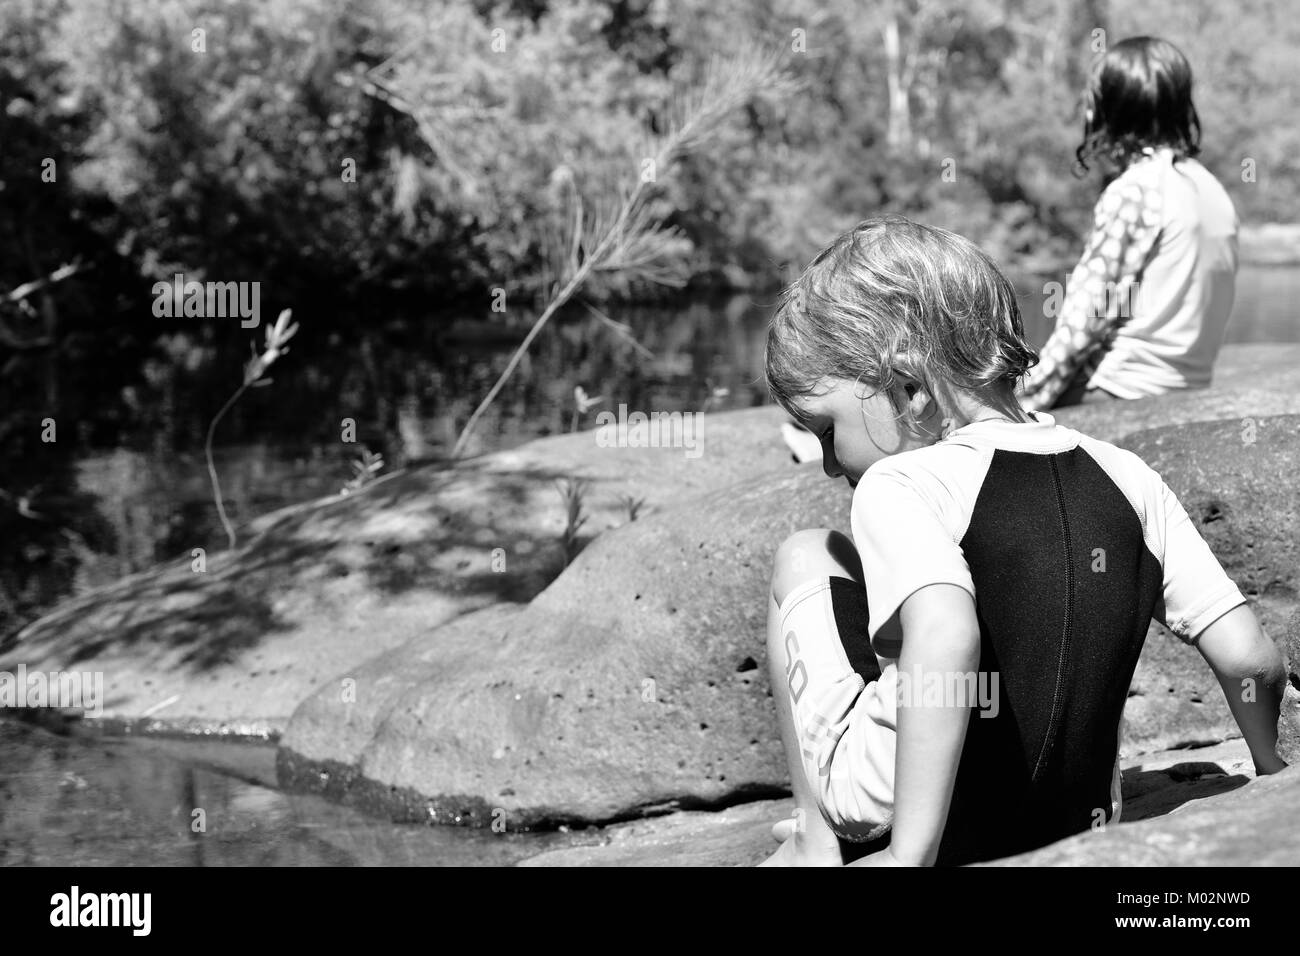 Two children sitting on rocks near a river, Alligator Creek, Bowling Green Bay National Park (Alligator Creek), - Stock Image